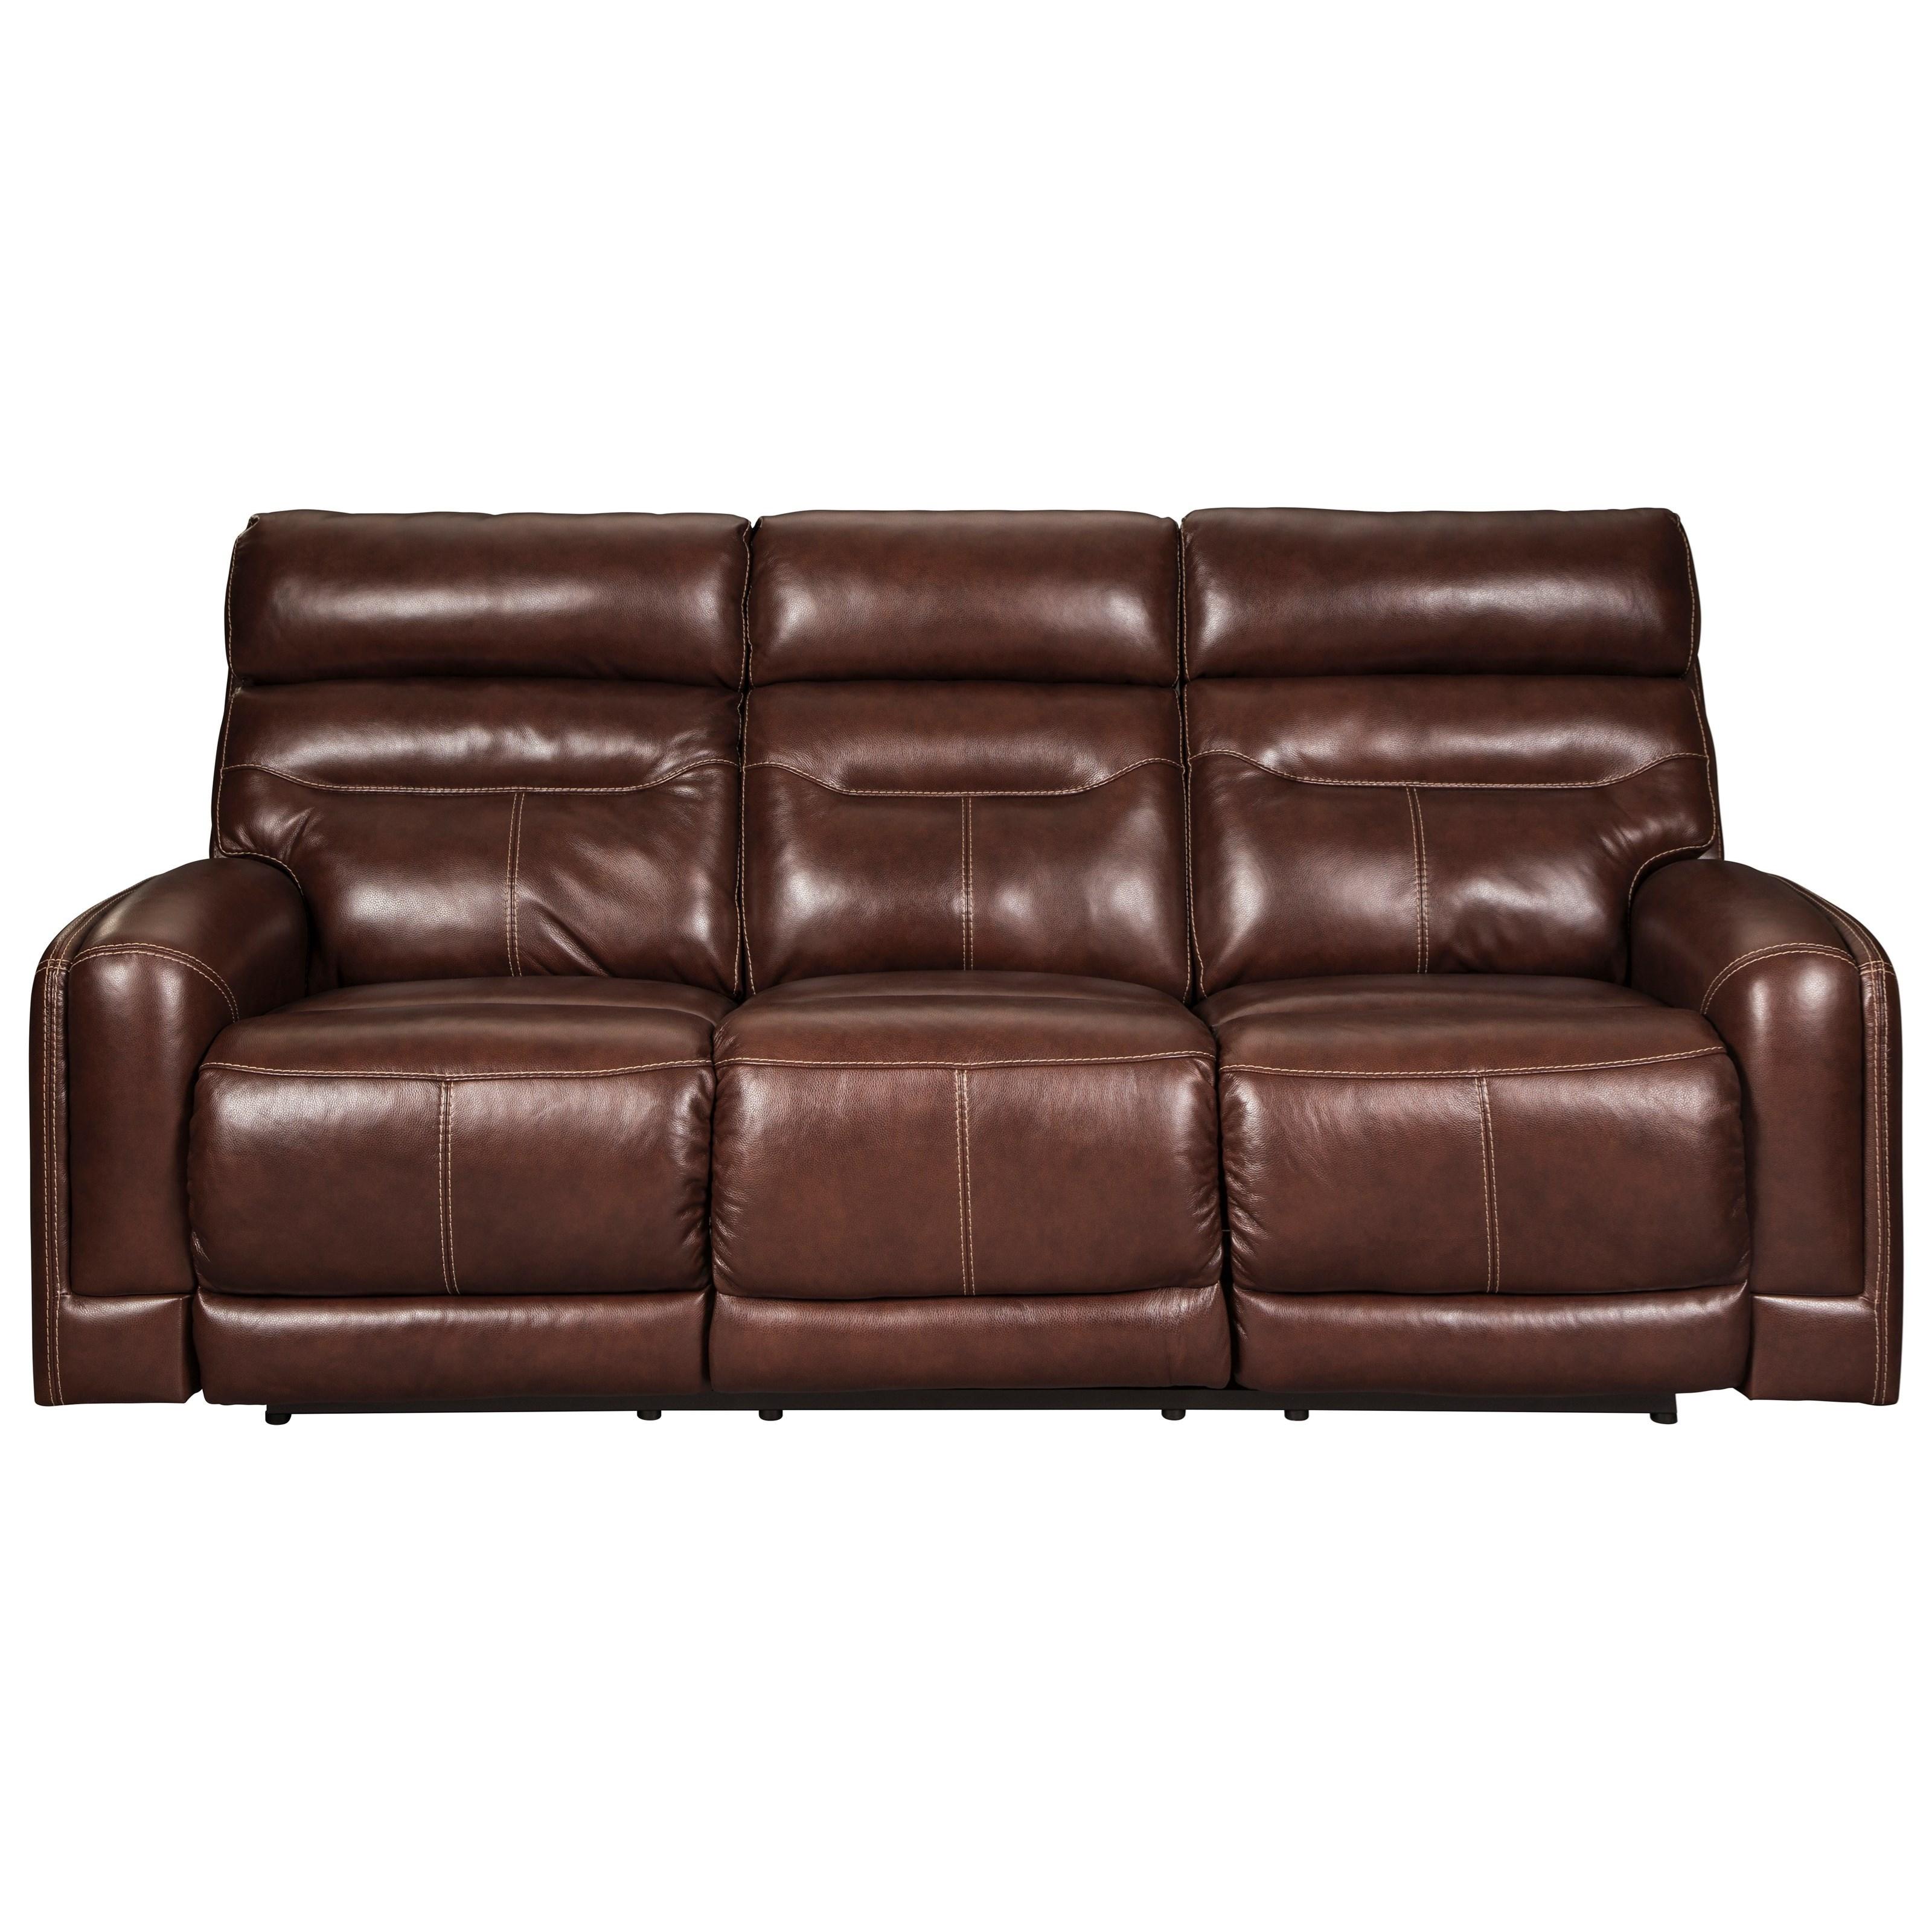 Power Reclining Sofa w/ Adjustable Headrests